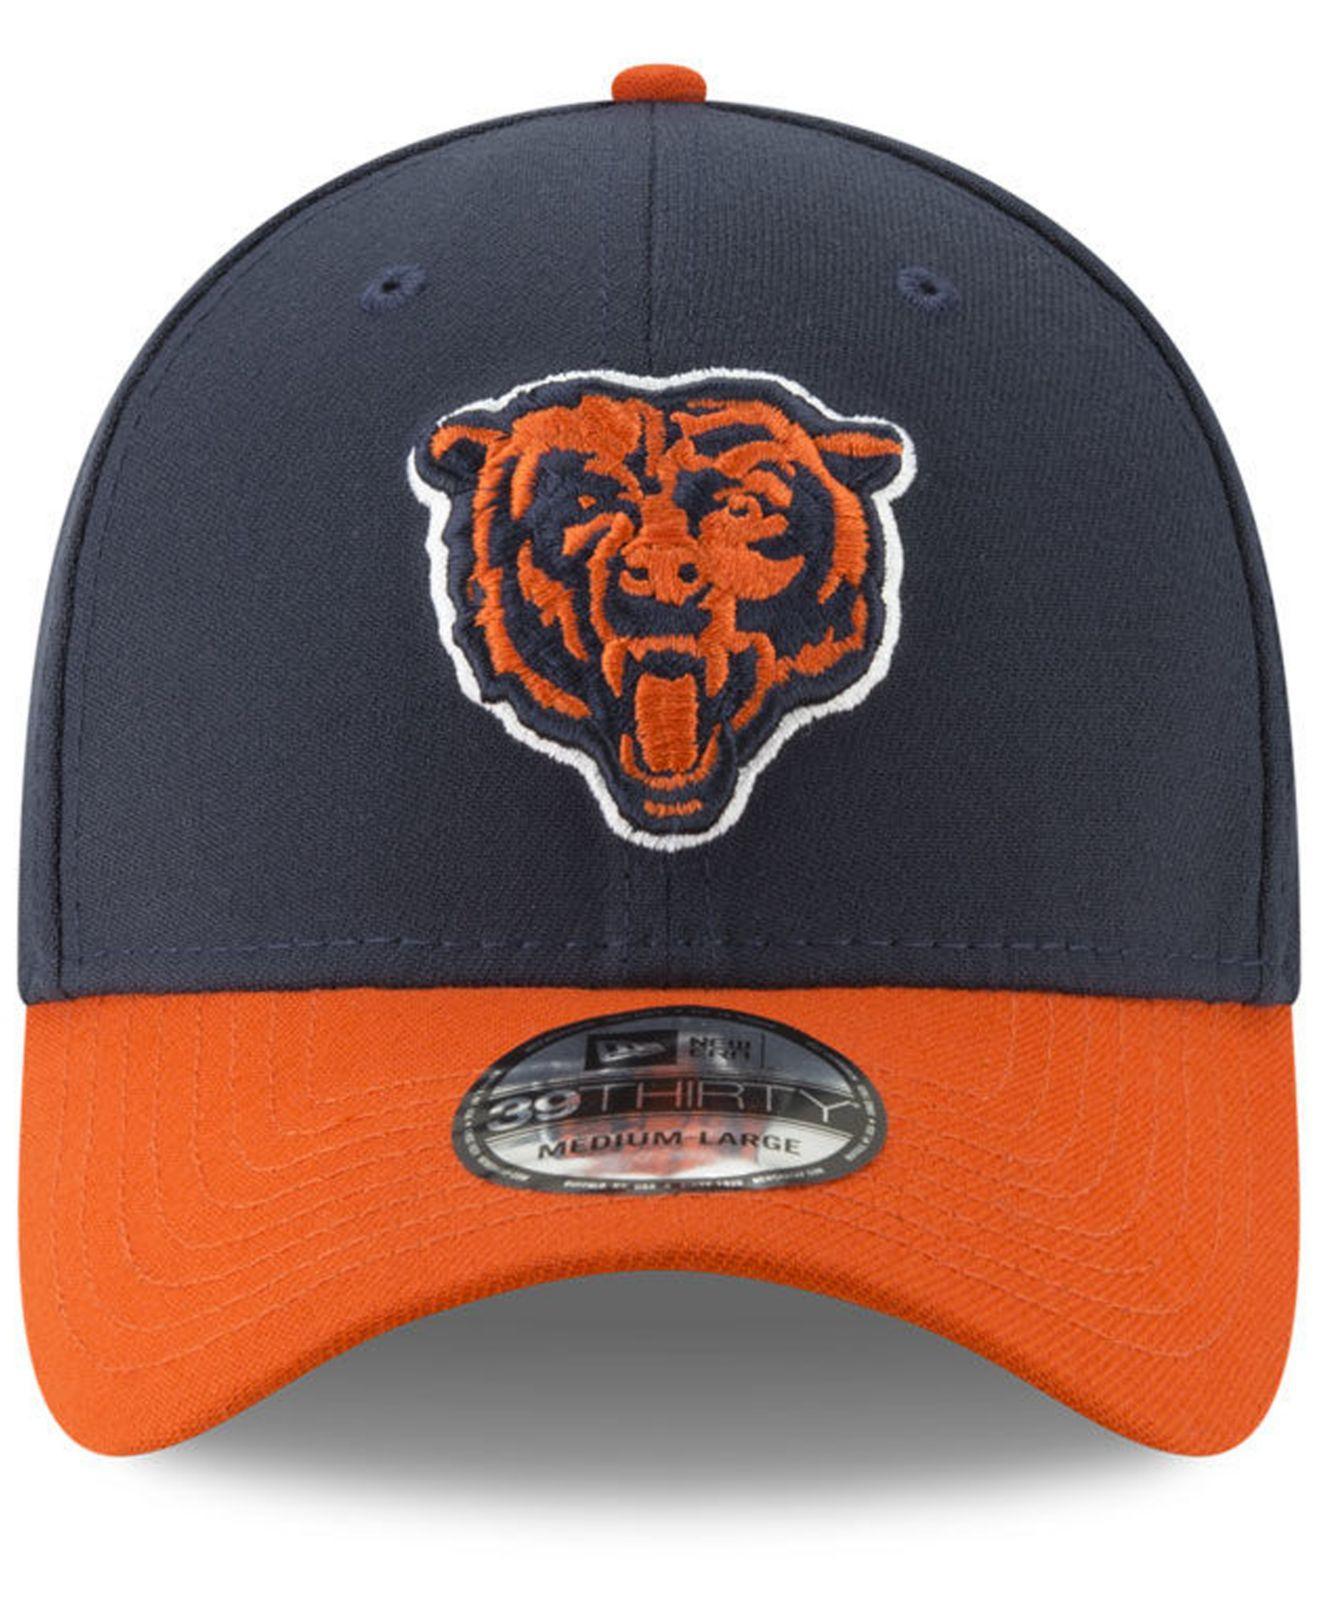 Lyst - Ktz Chicago Bears New Team Classic 39thirty Cap in Blue for Men 0e3cccddac9c